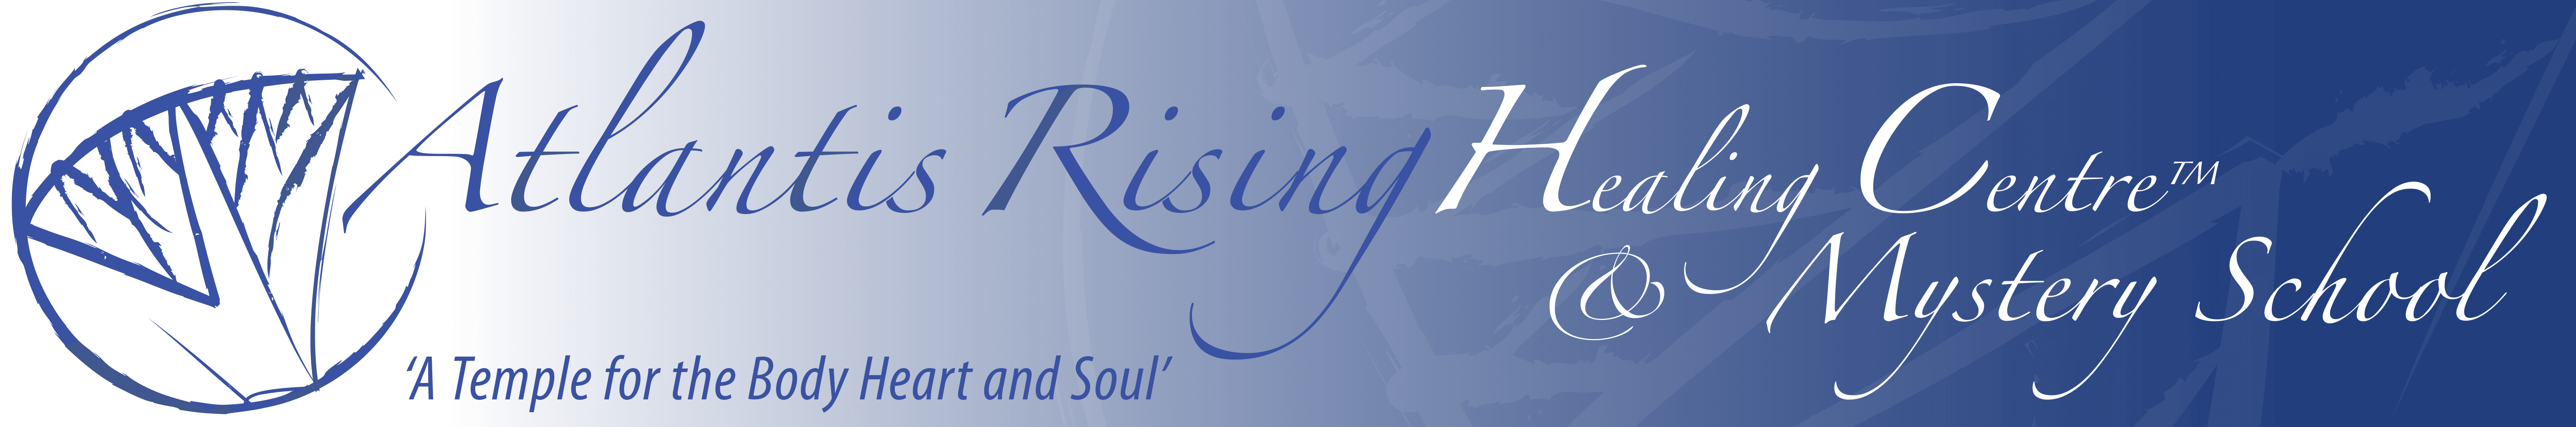 Atlantis Rising Healing Centre & Mystery School